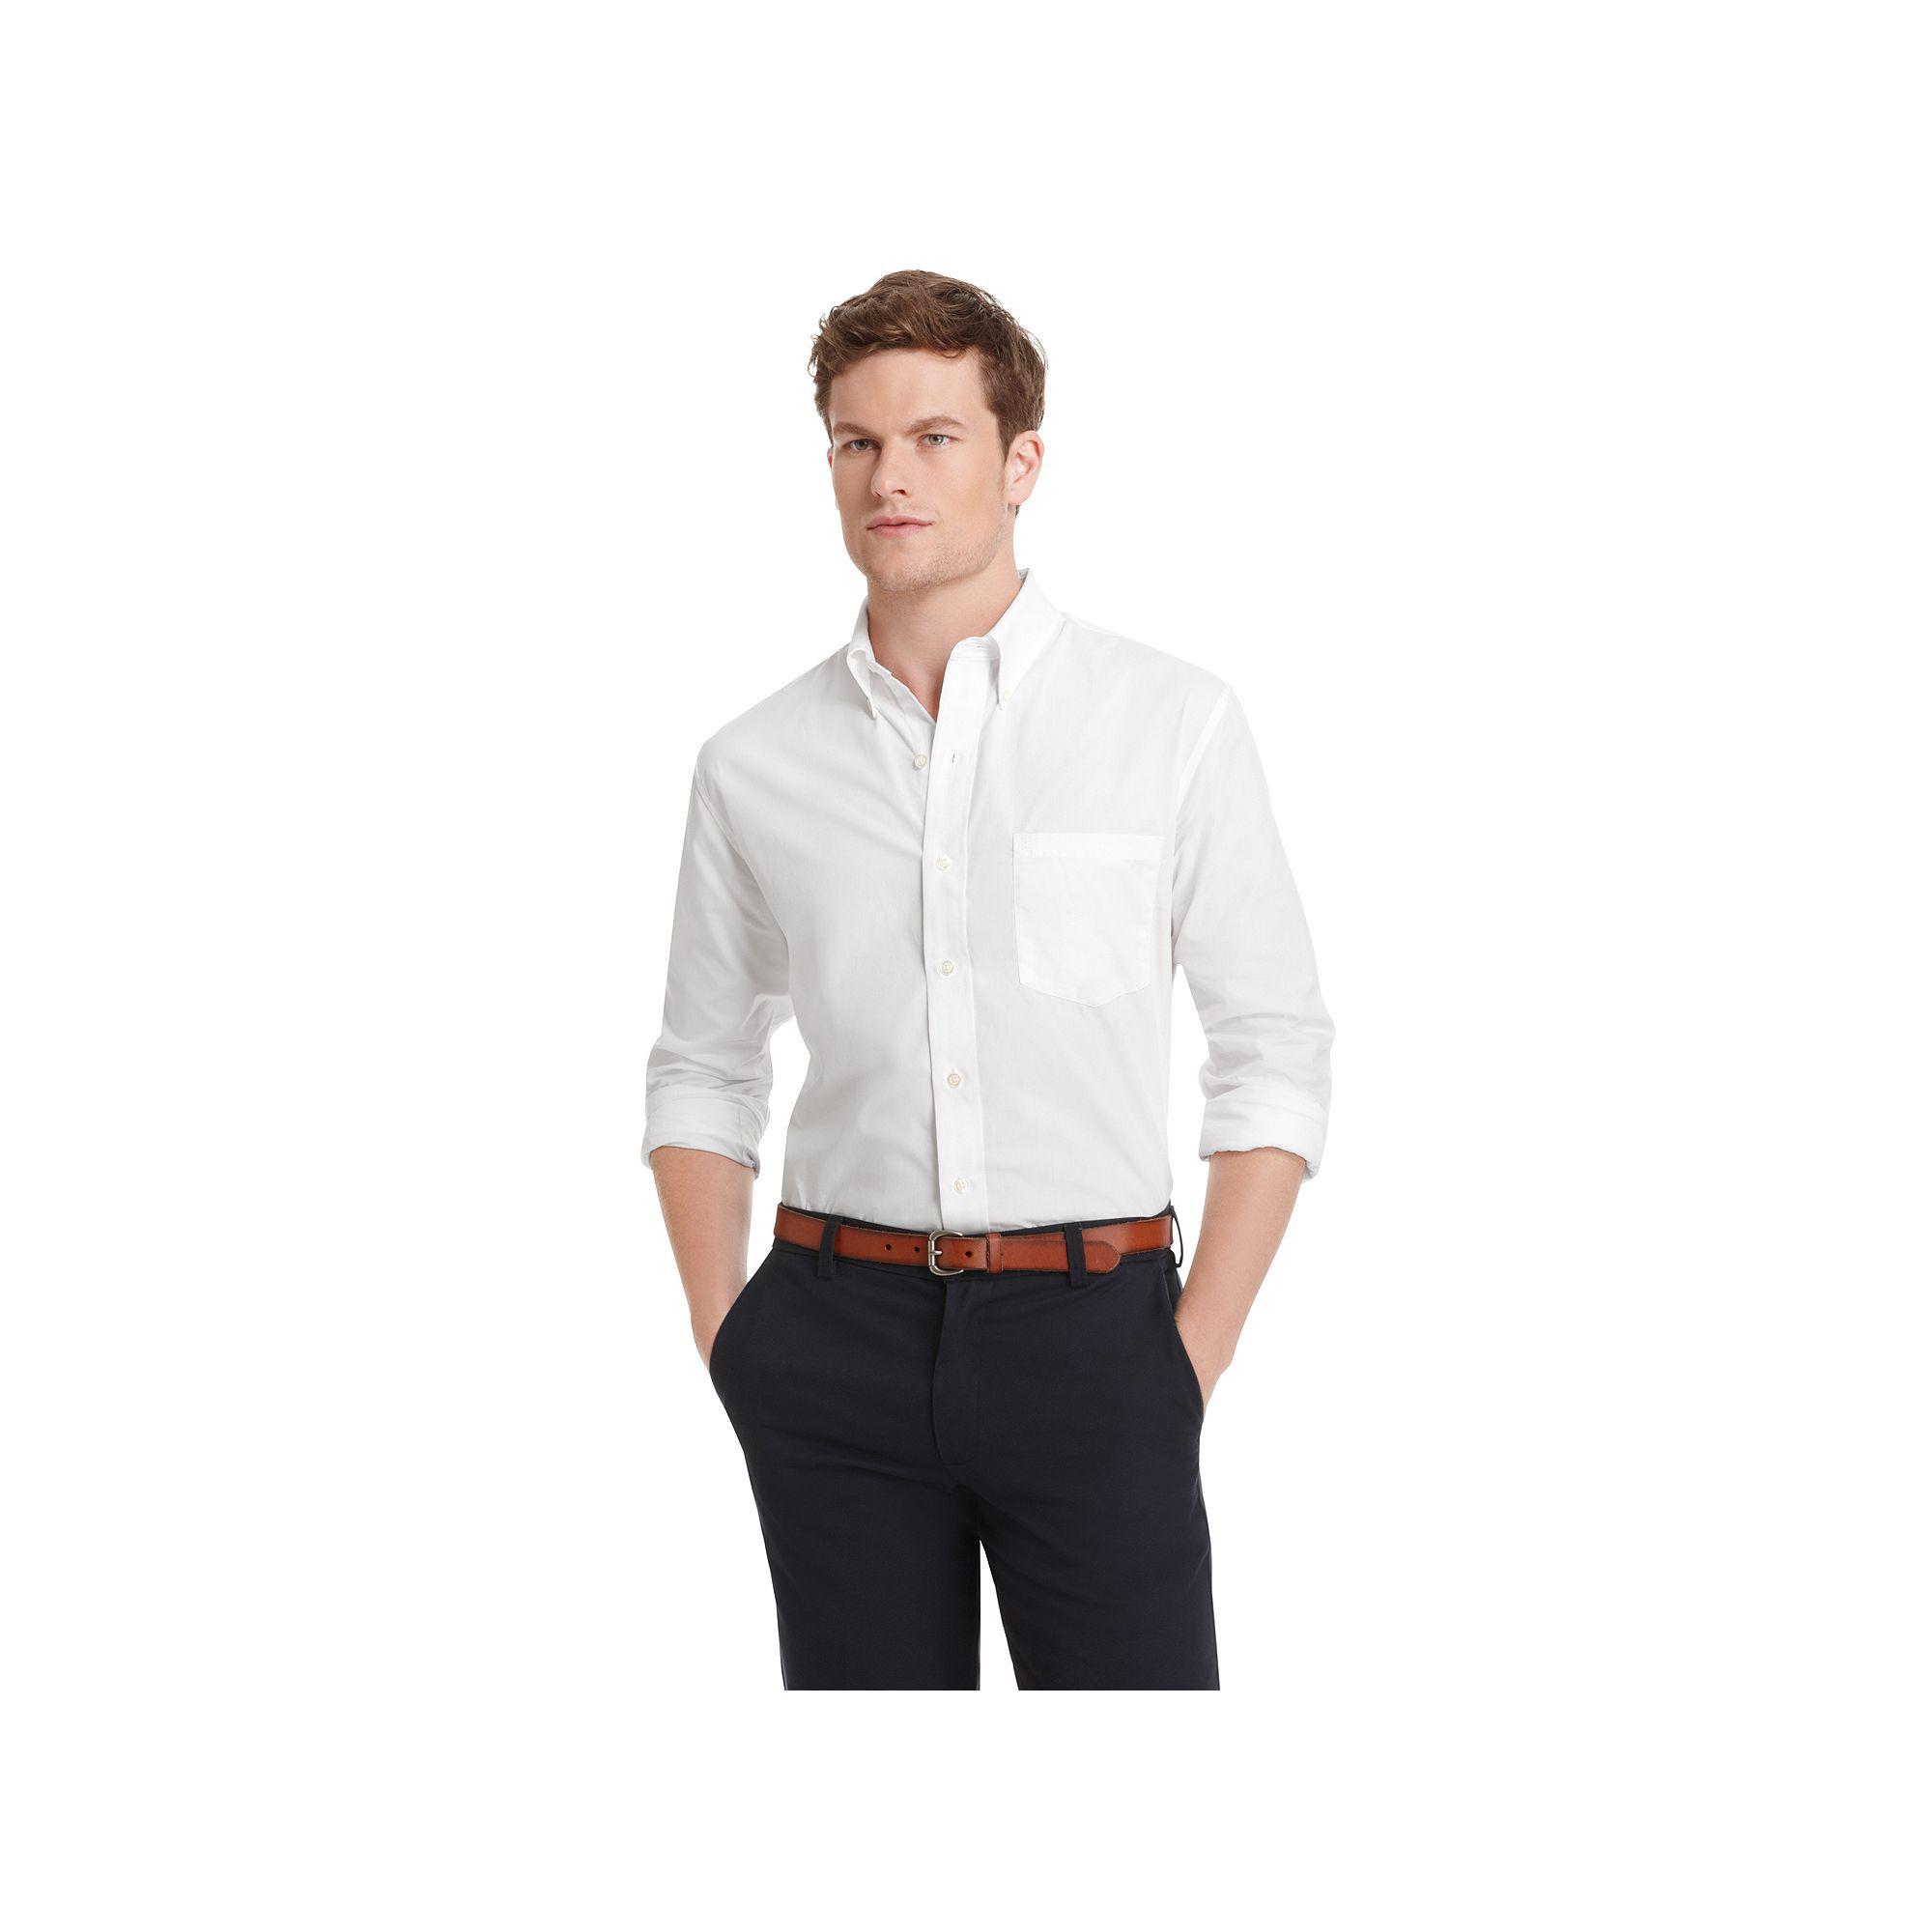 dd9eeb5d0c69 Men s IZOD Basic Essential Button-Down Shirt